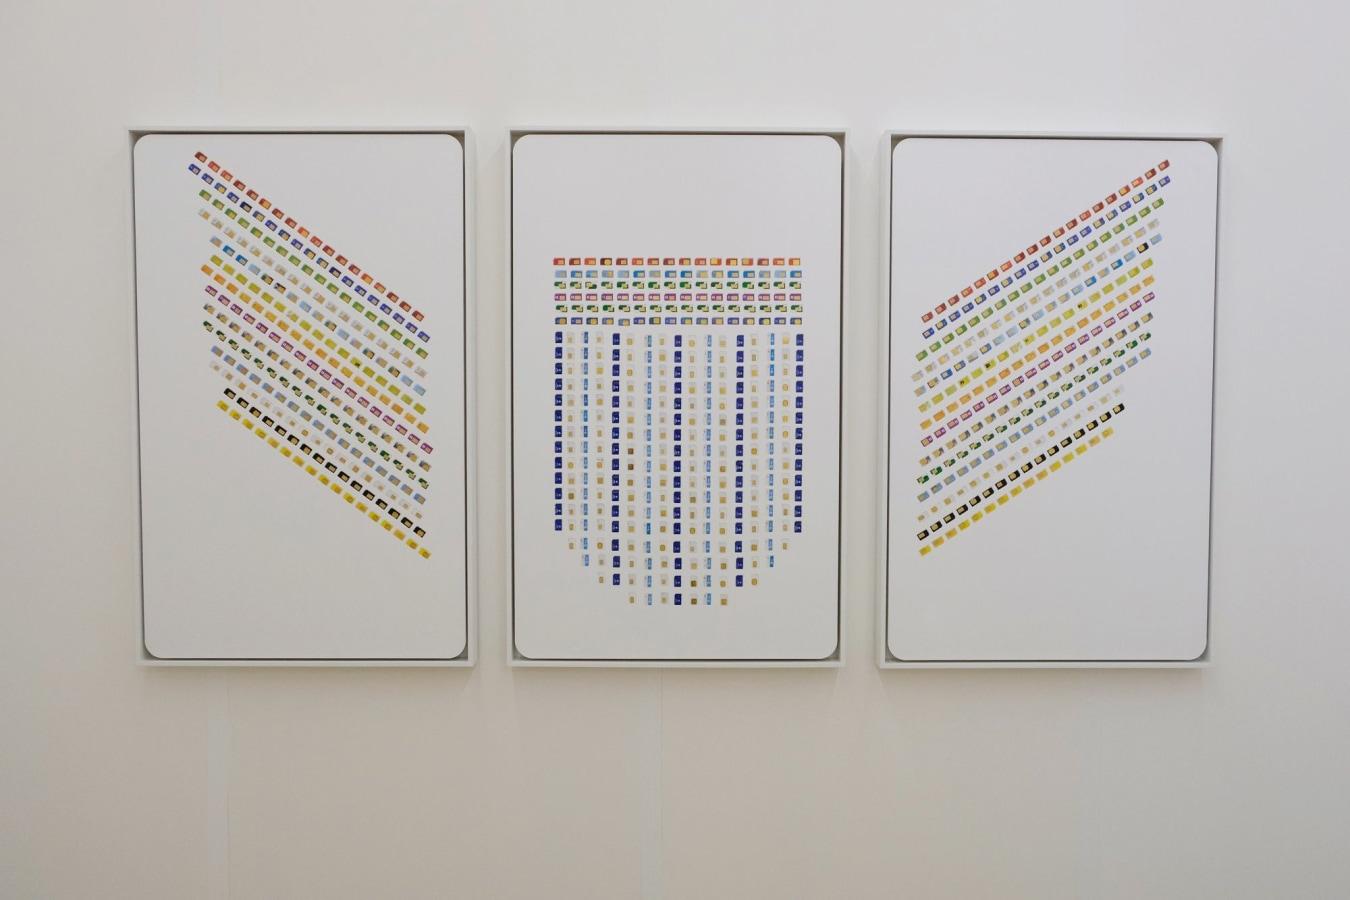 Art Rotterdam 2019, Harm van den Dorpel, Constant Dullaart, JODI, Jan Robert Leegte, Rafaël Rozendaal,